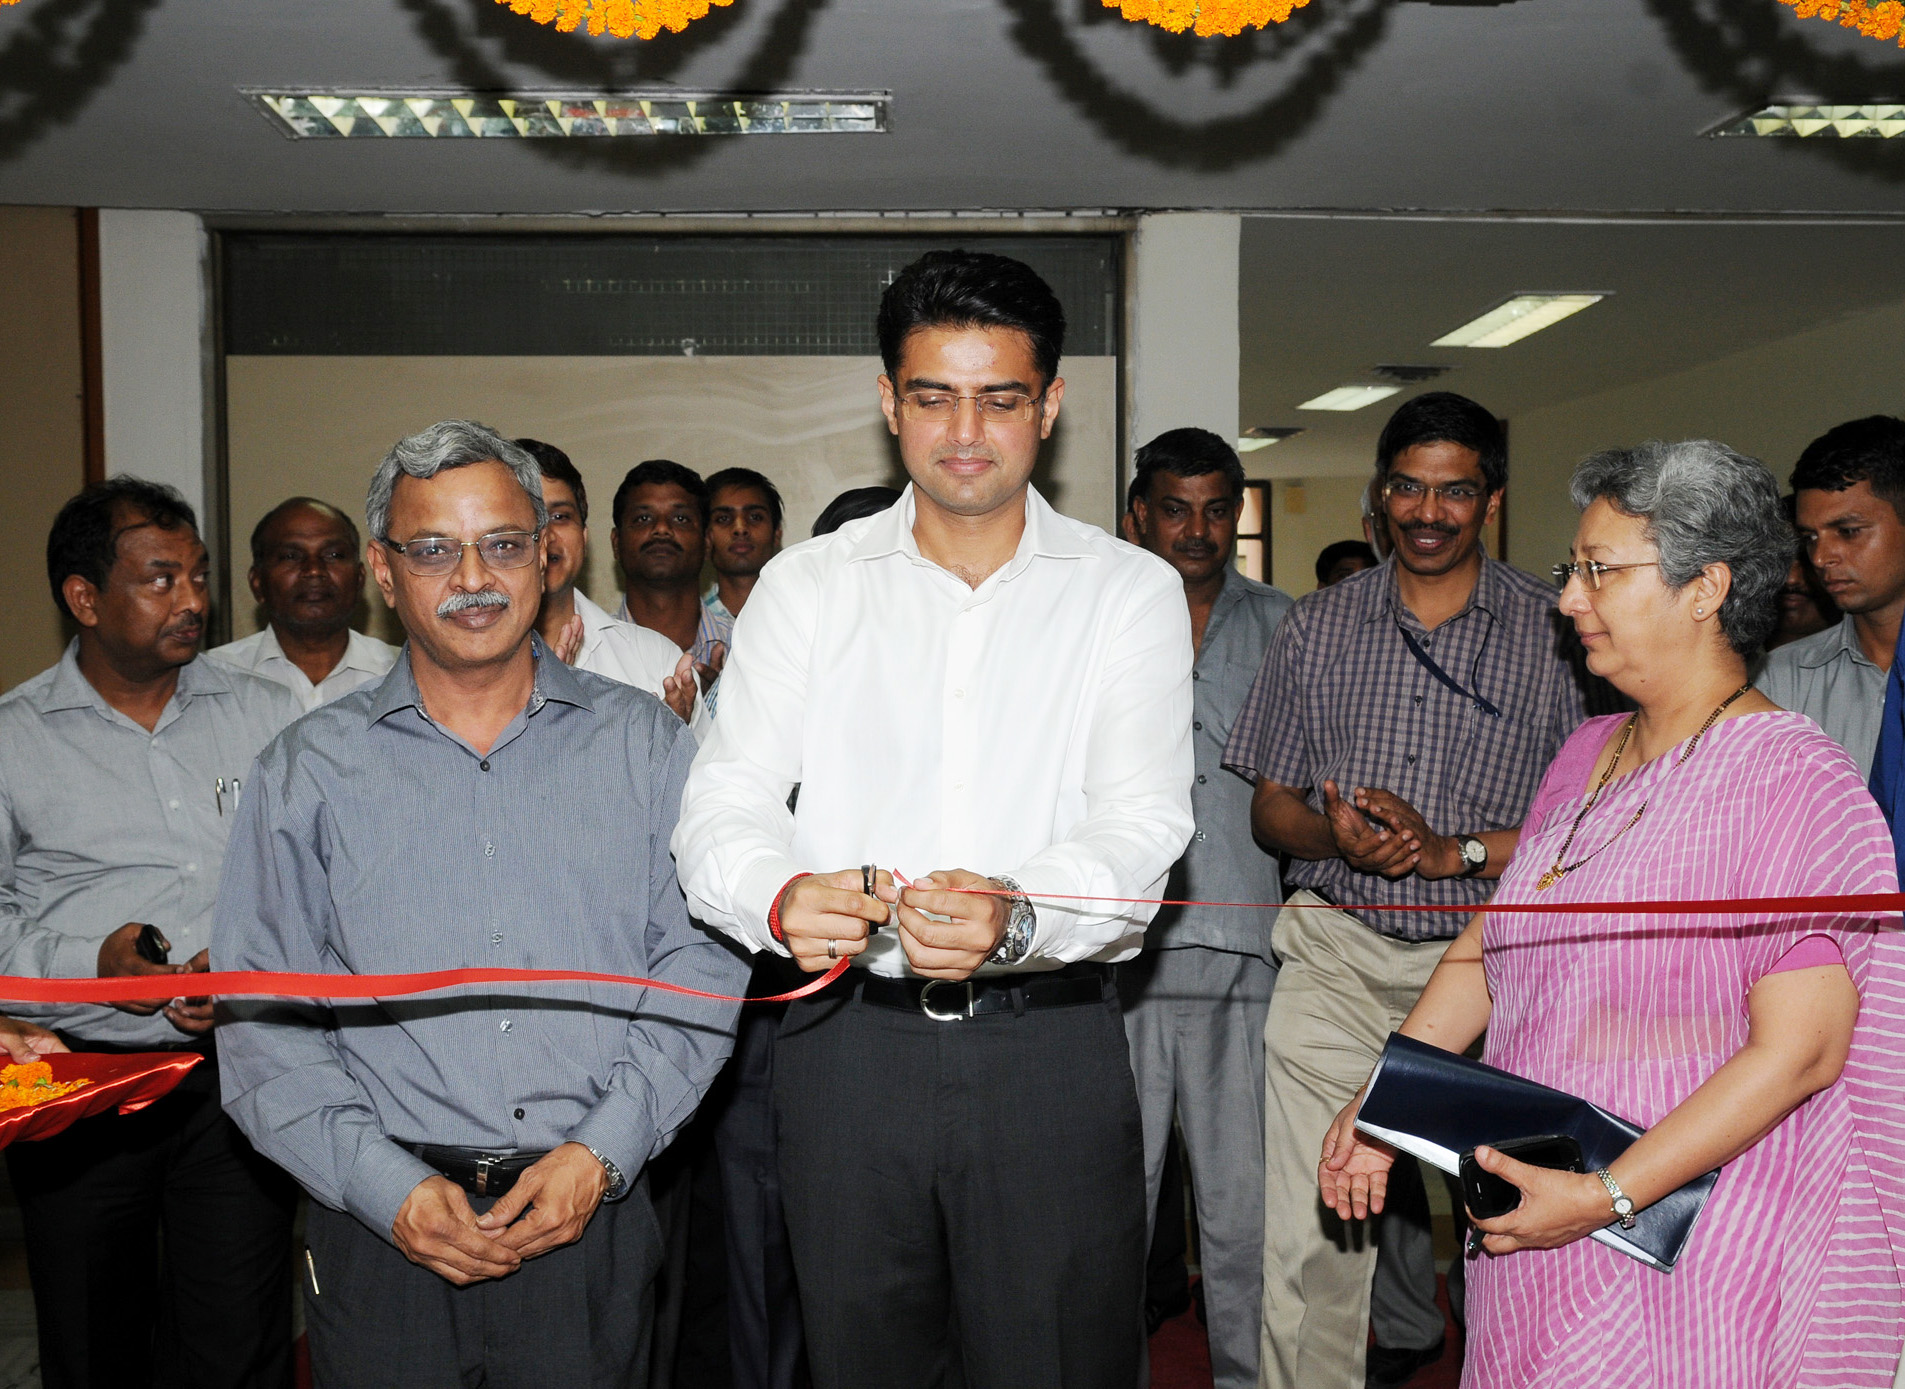 File:Sachin Pilot inaugurating the Centre for e-Governance (CeG), in